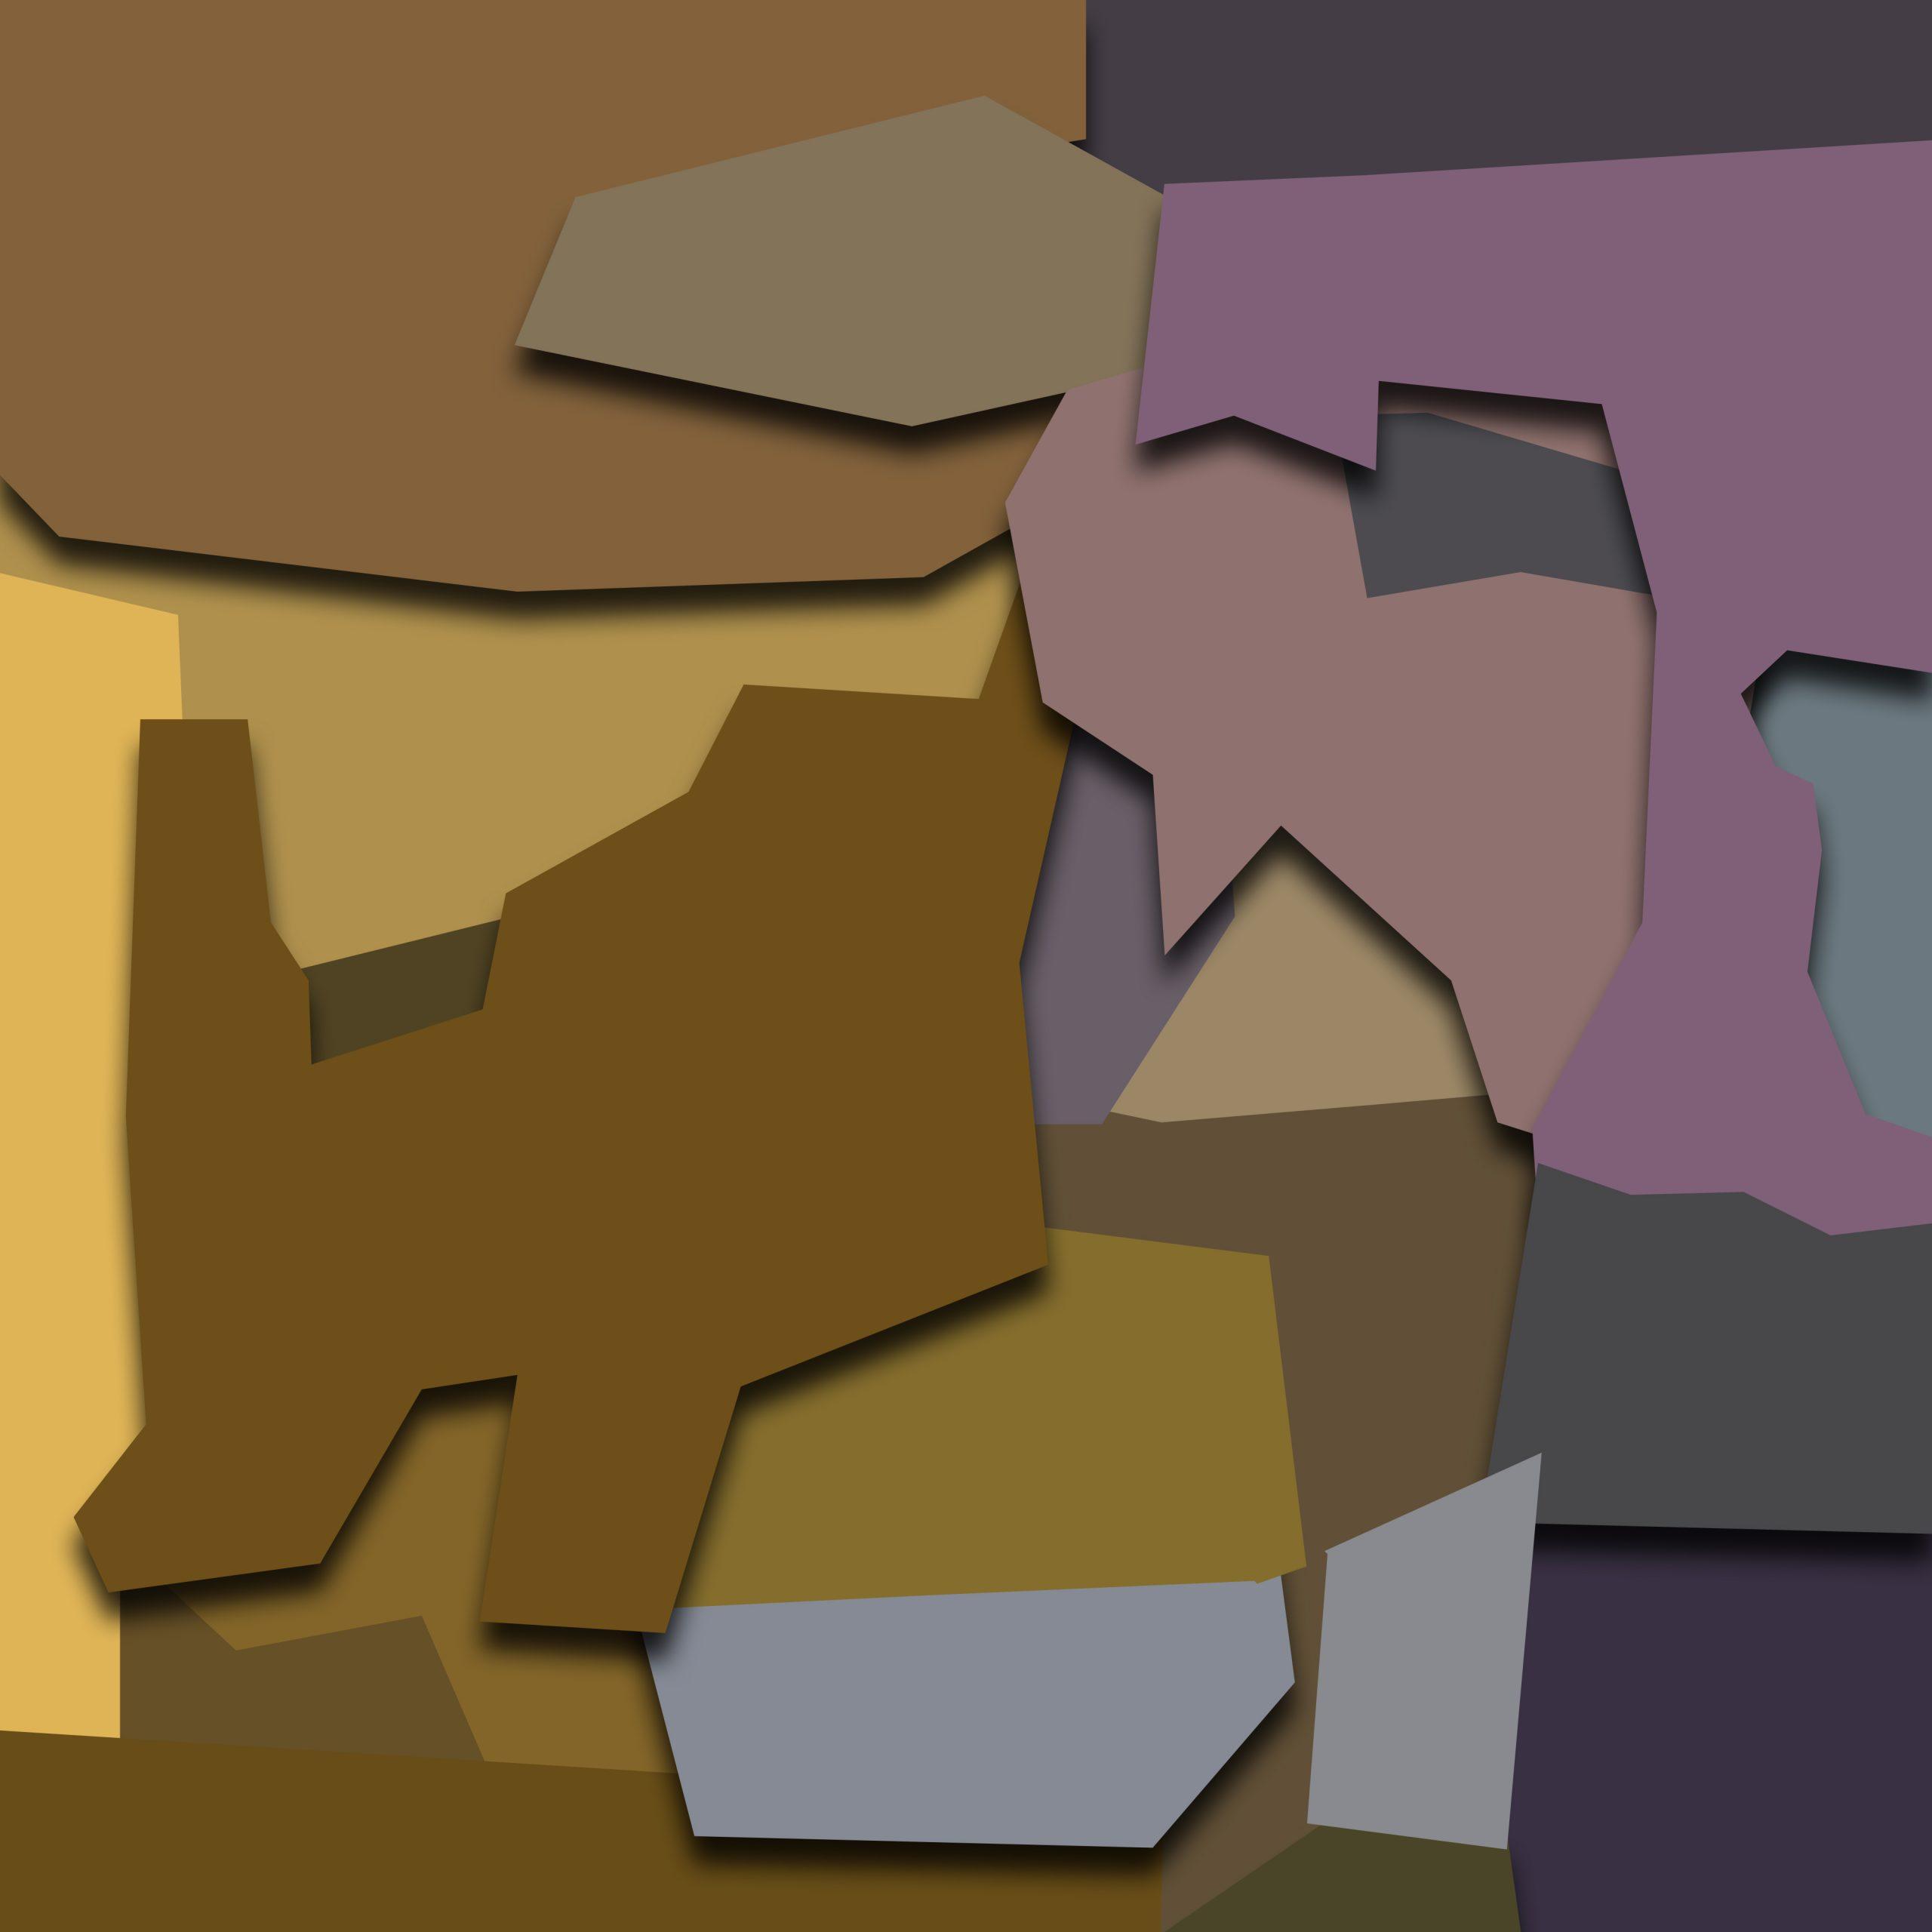 Illustration of origami art